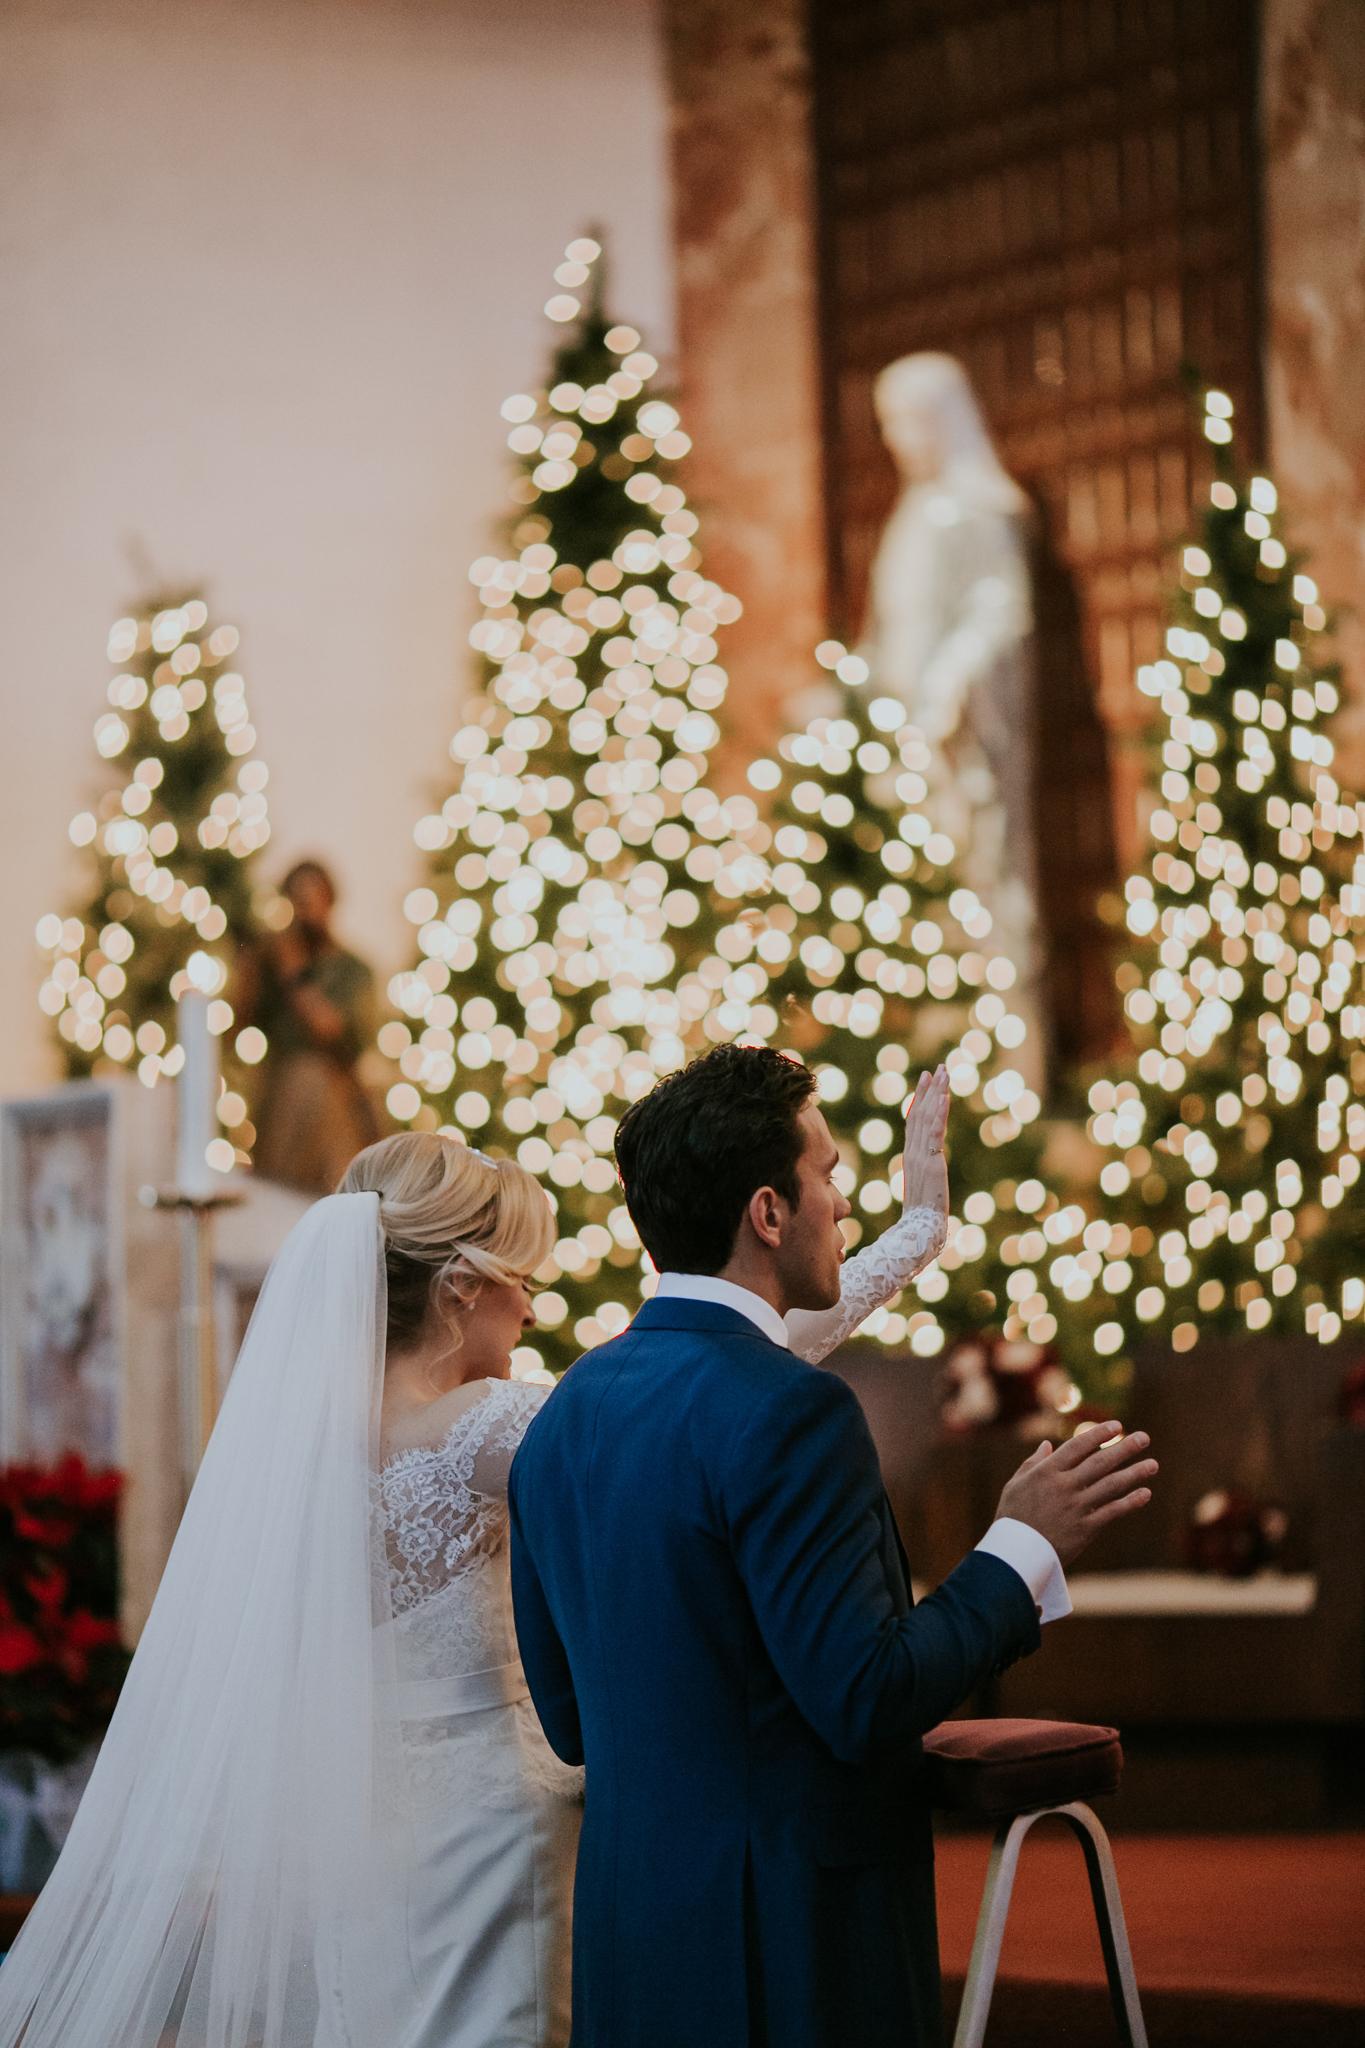 20151230_hussem_wedding_0551_web.jpg